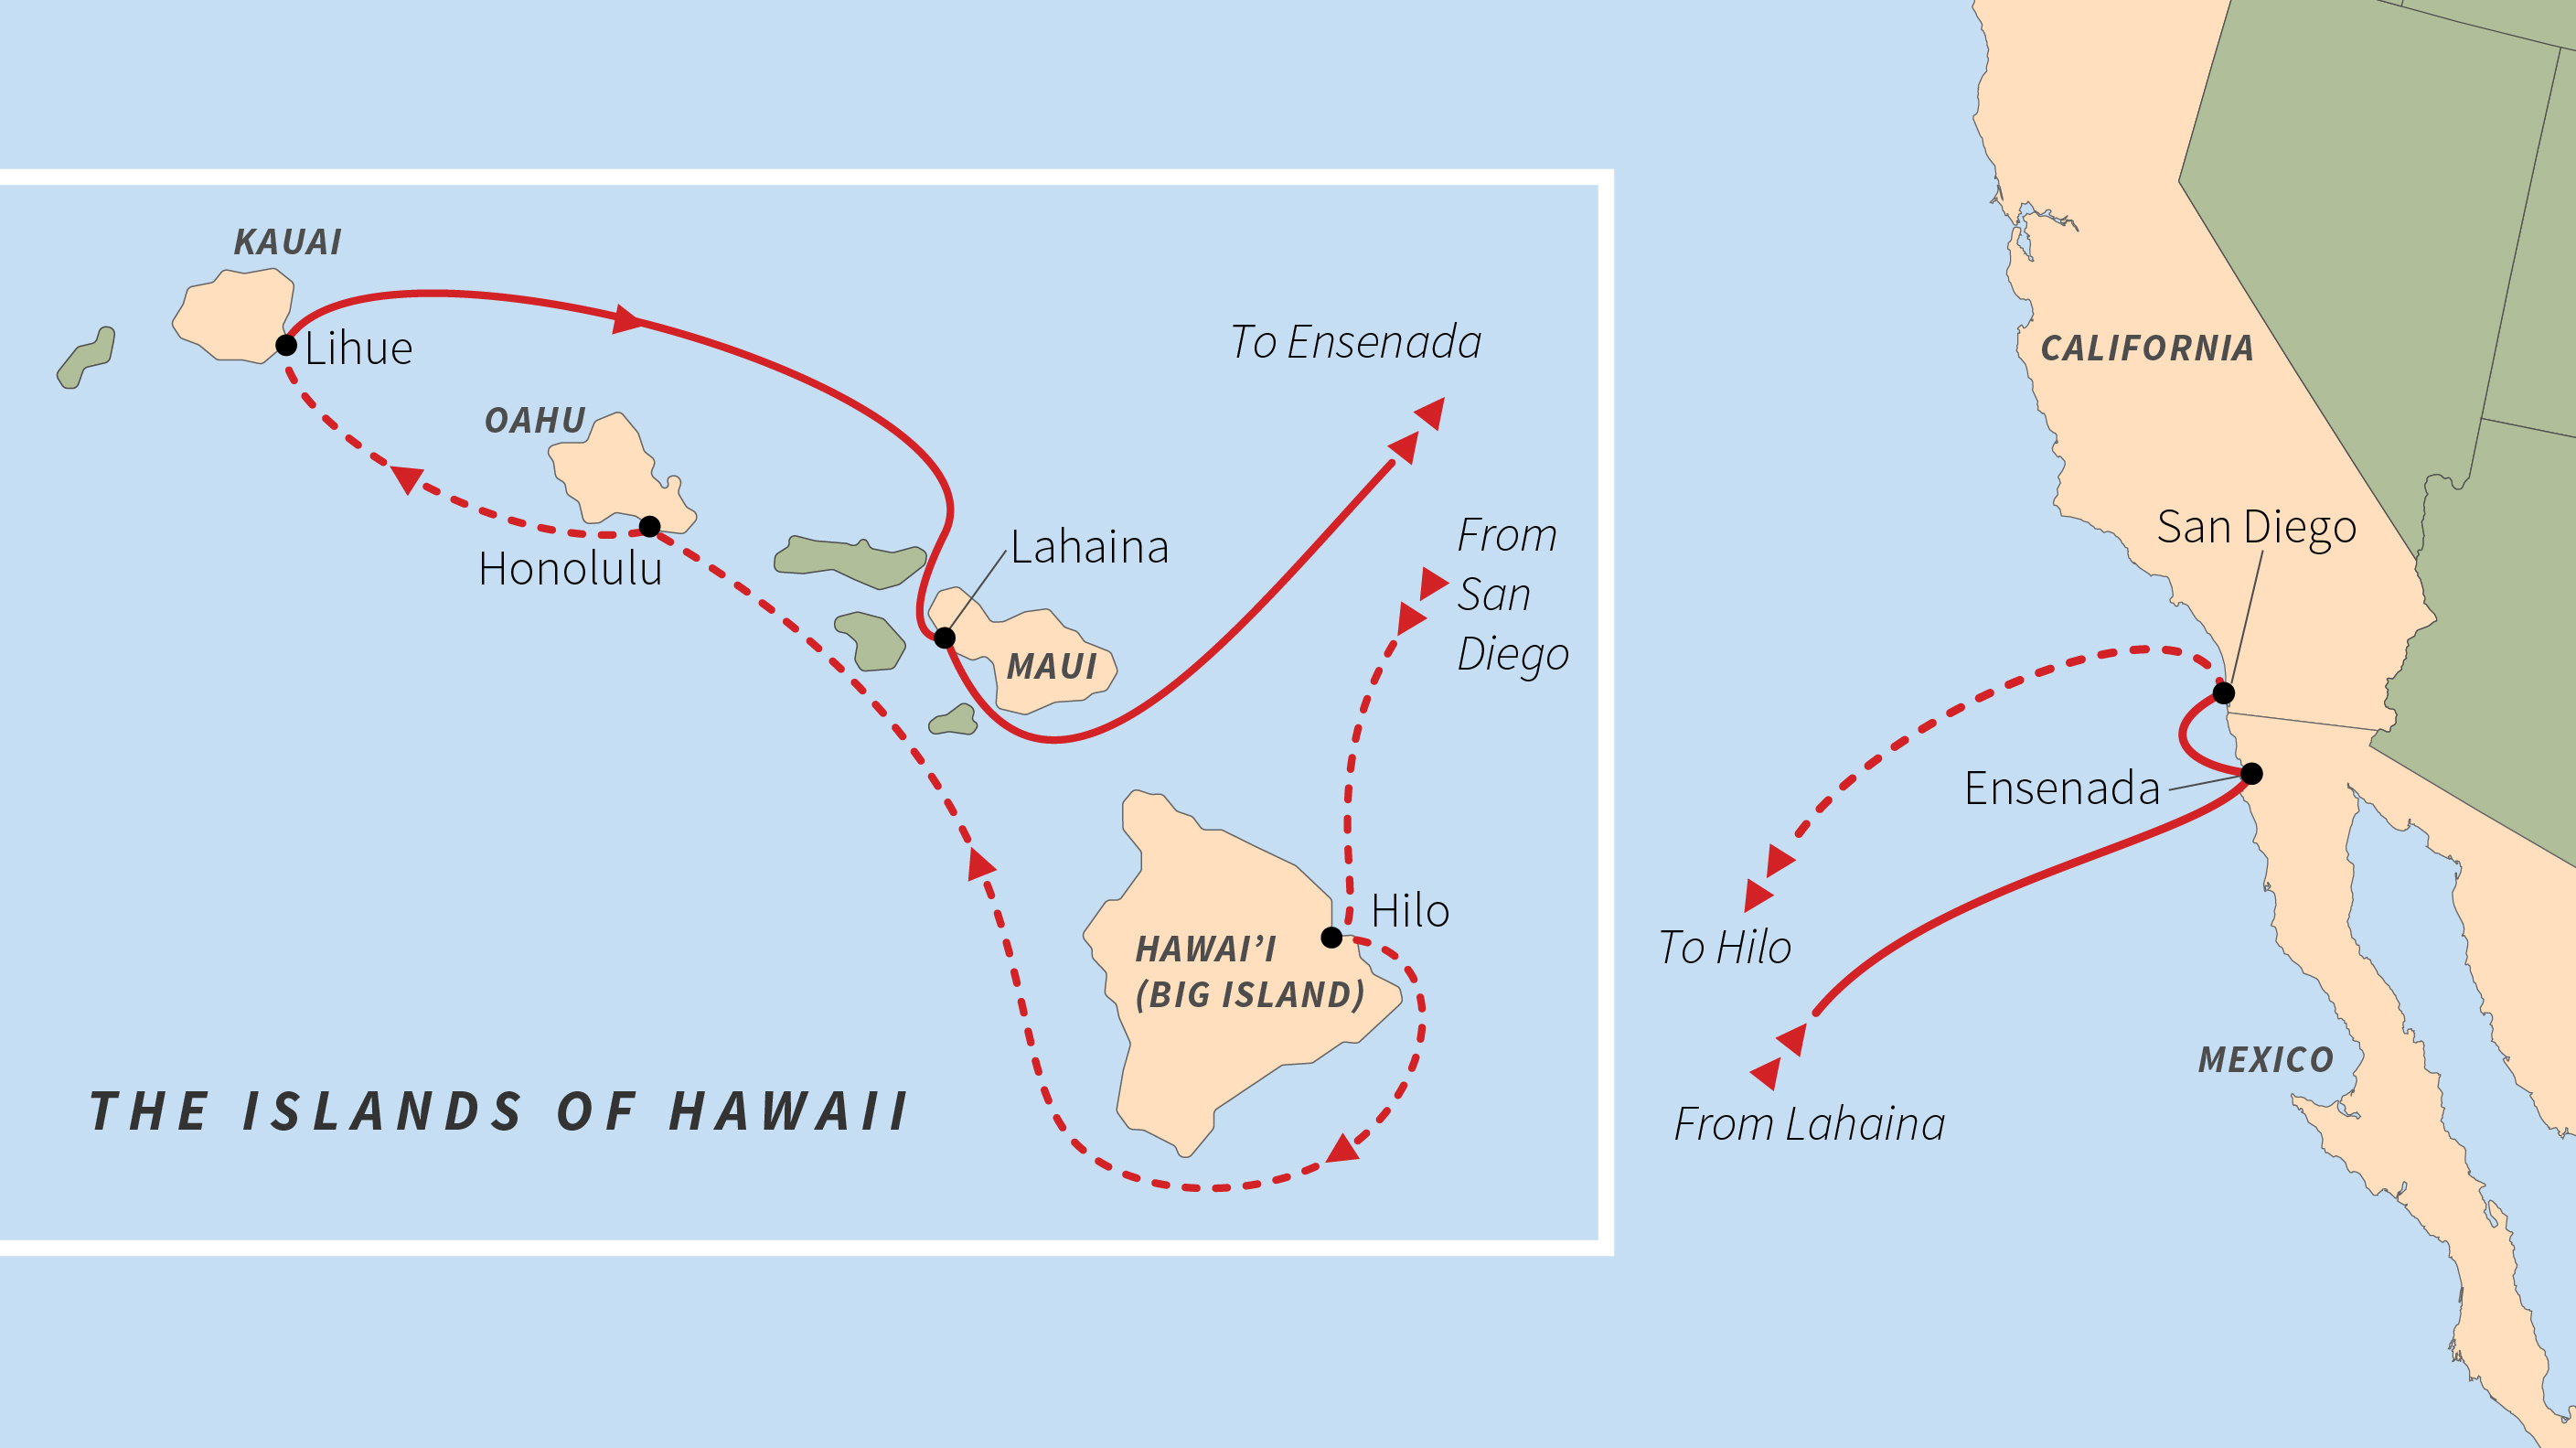 Map Of California And Hawaii.Hawaiian Nature Culture Travel Road Scholar